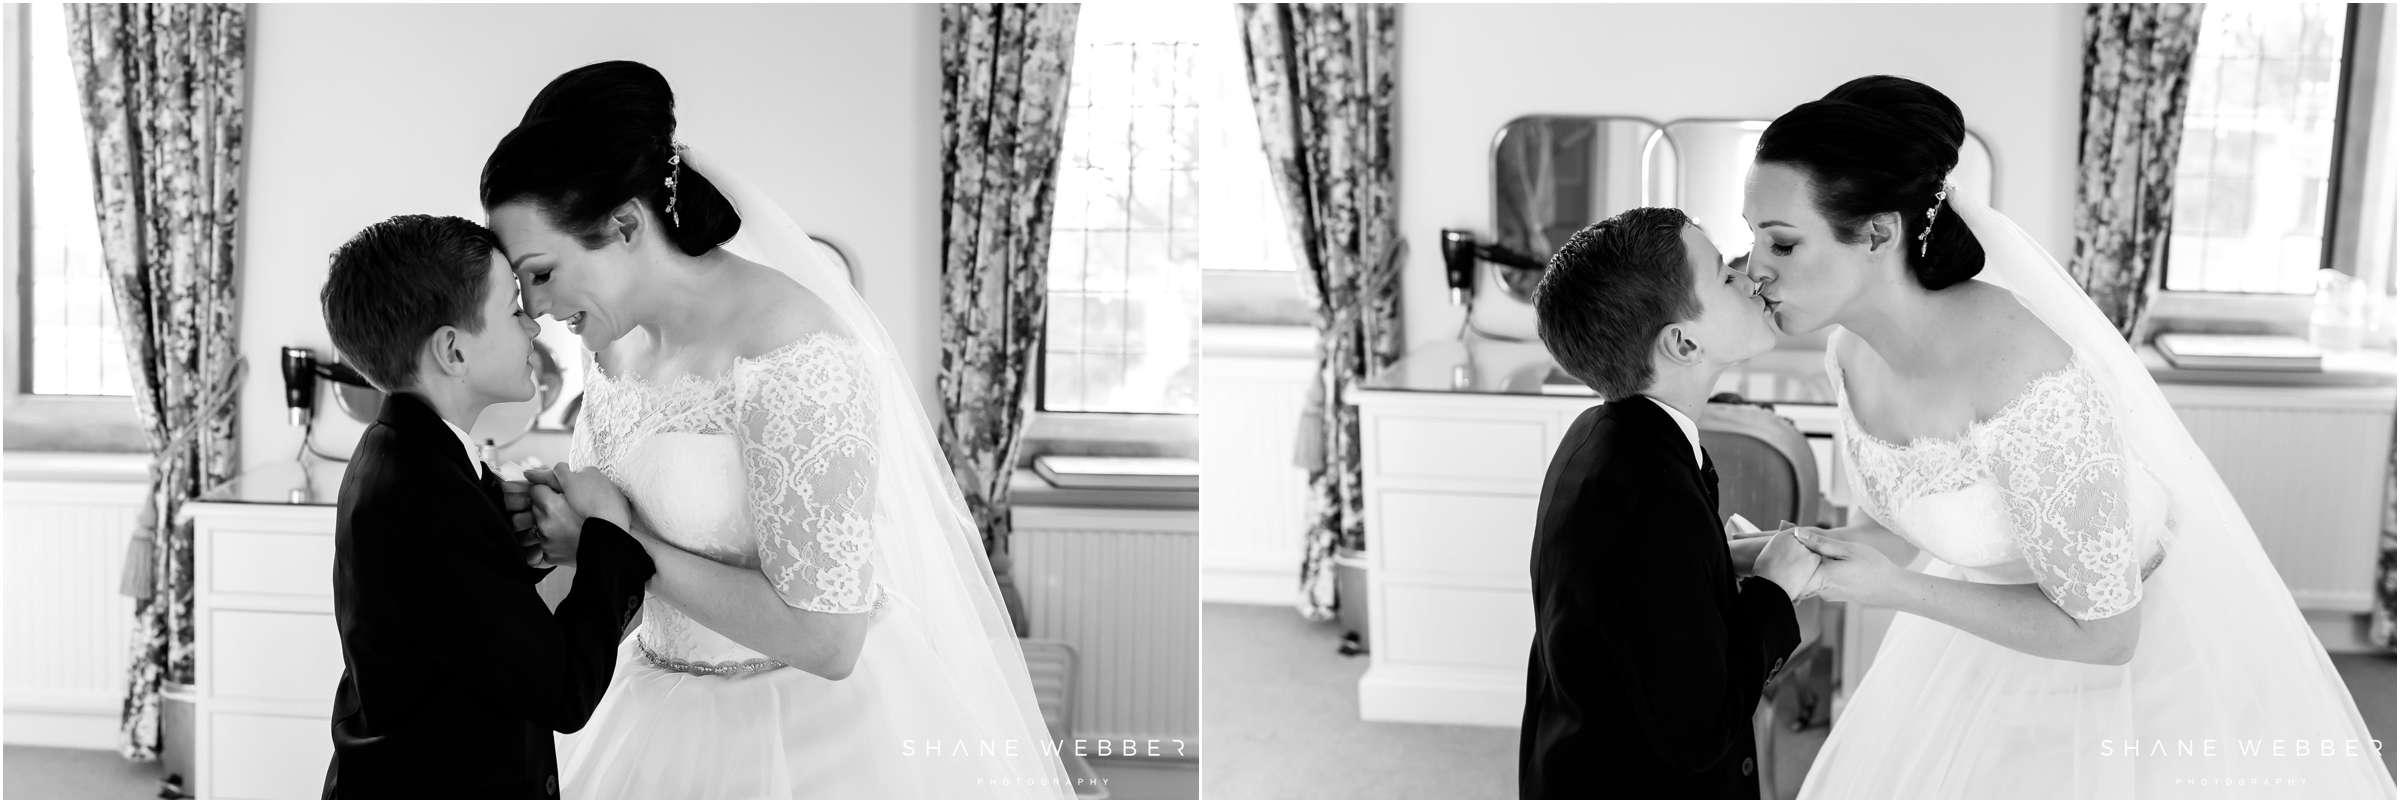 documentary wedding photography Colshaw Hall